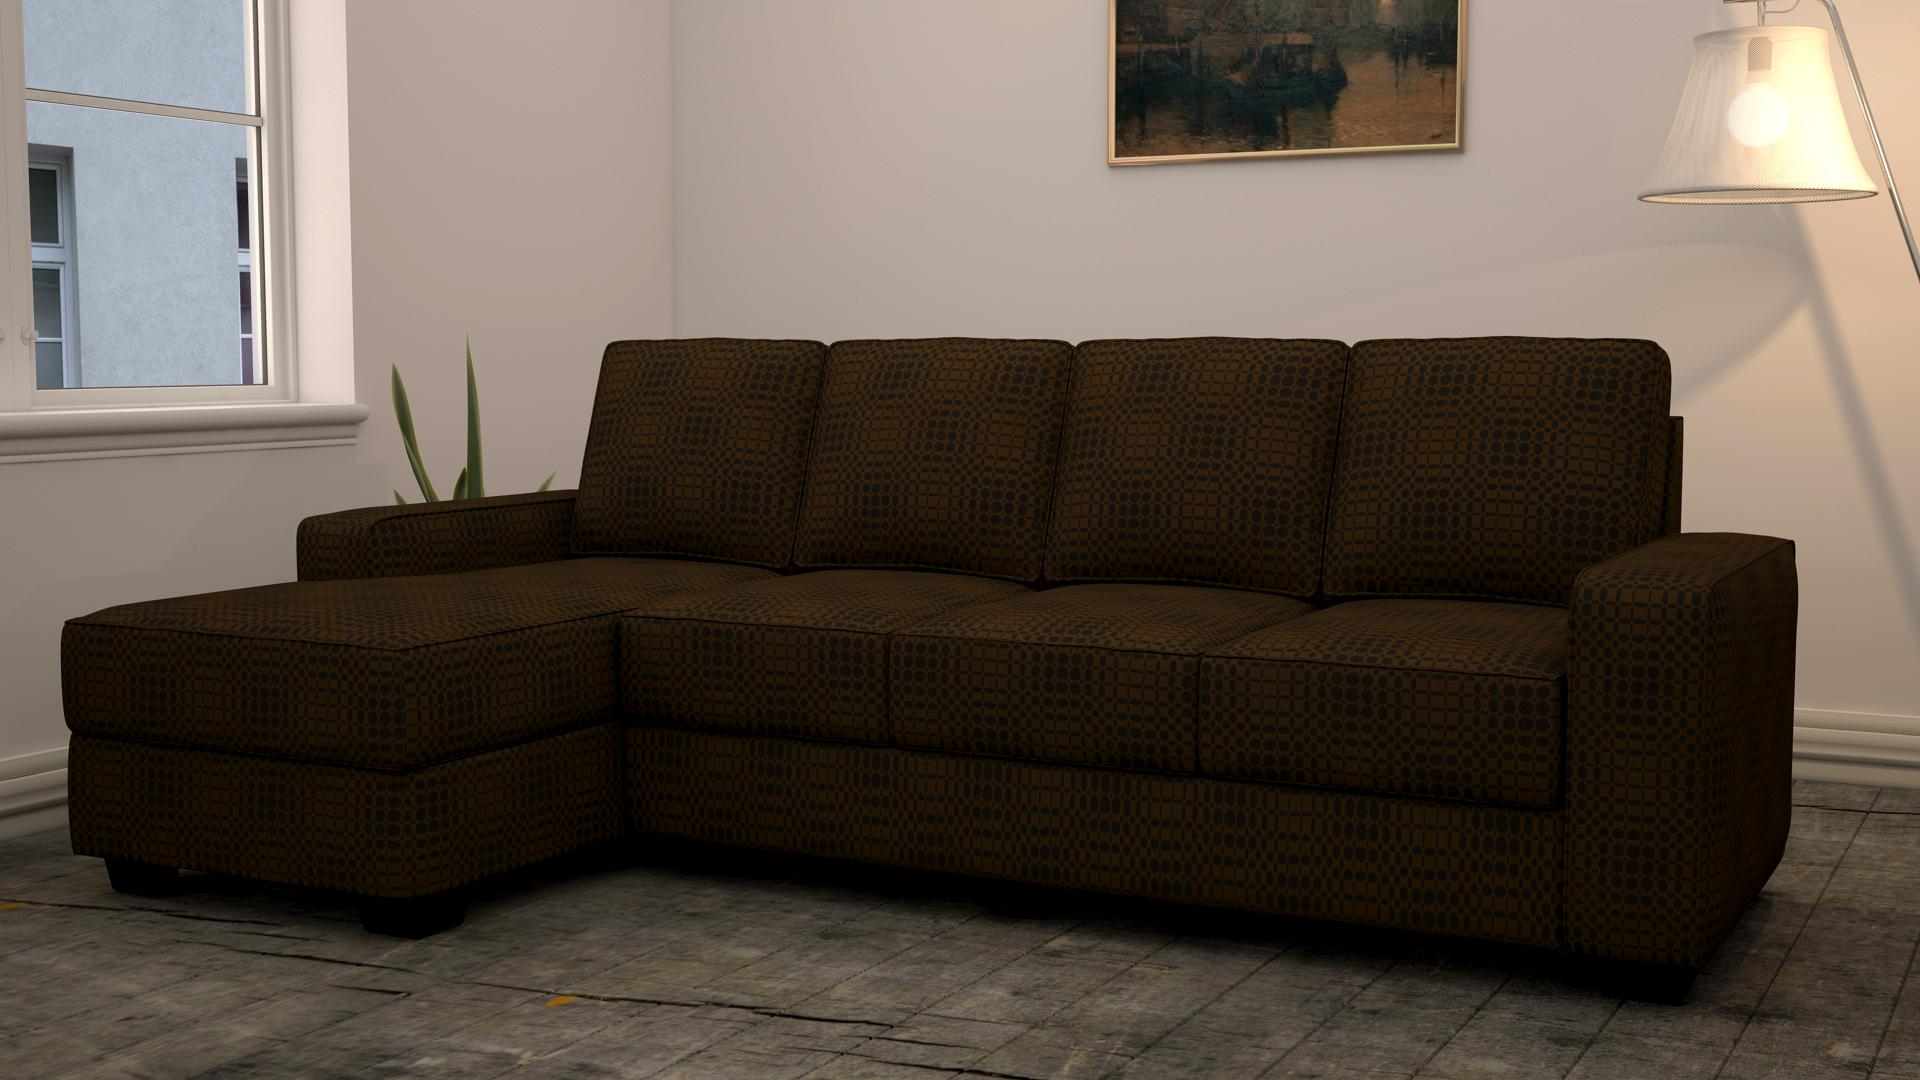 Lounger sofa designs online